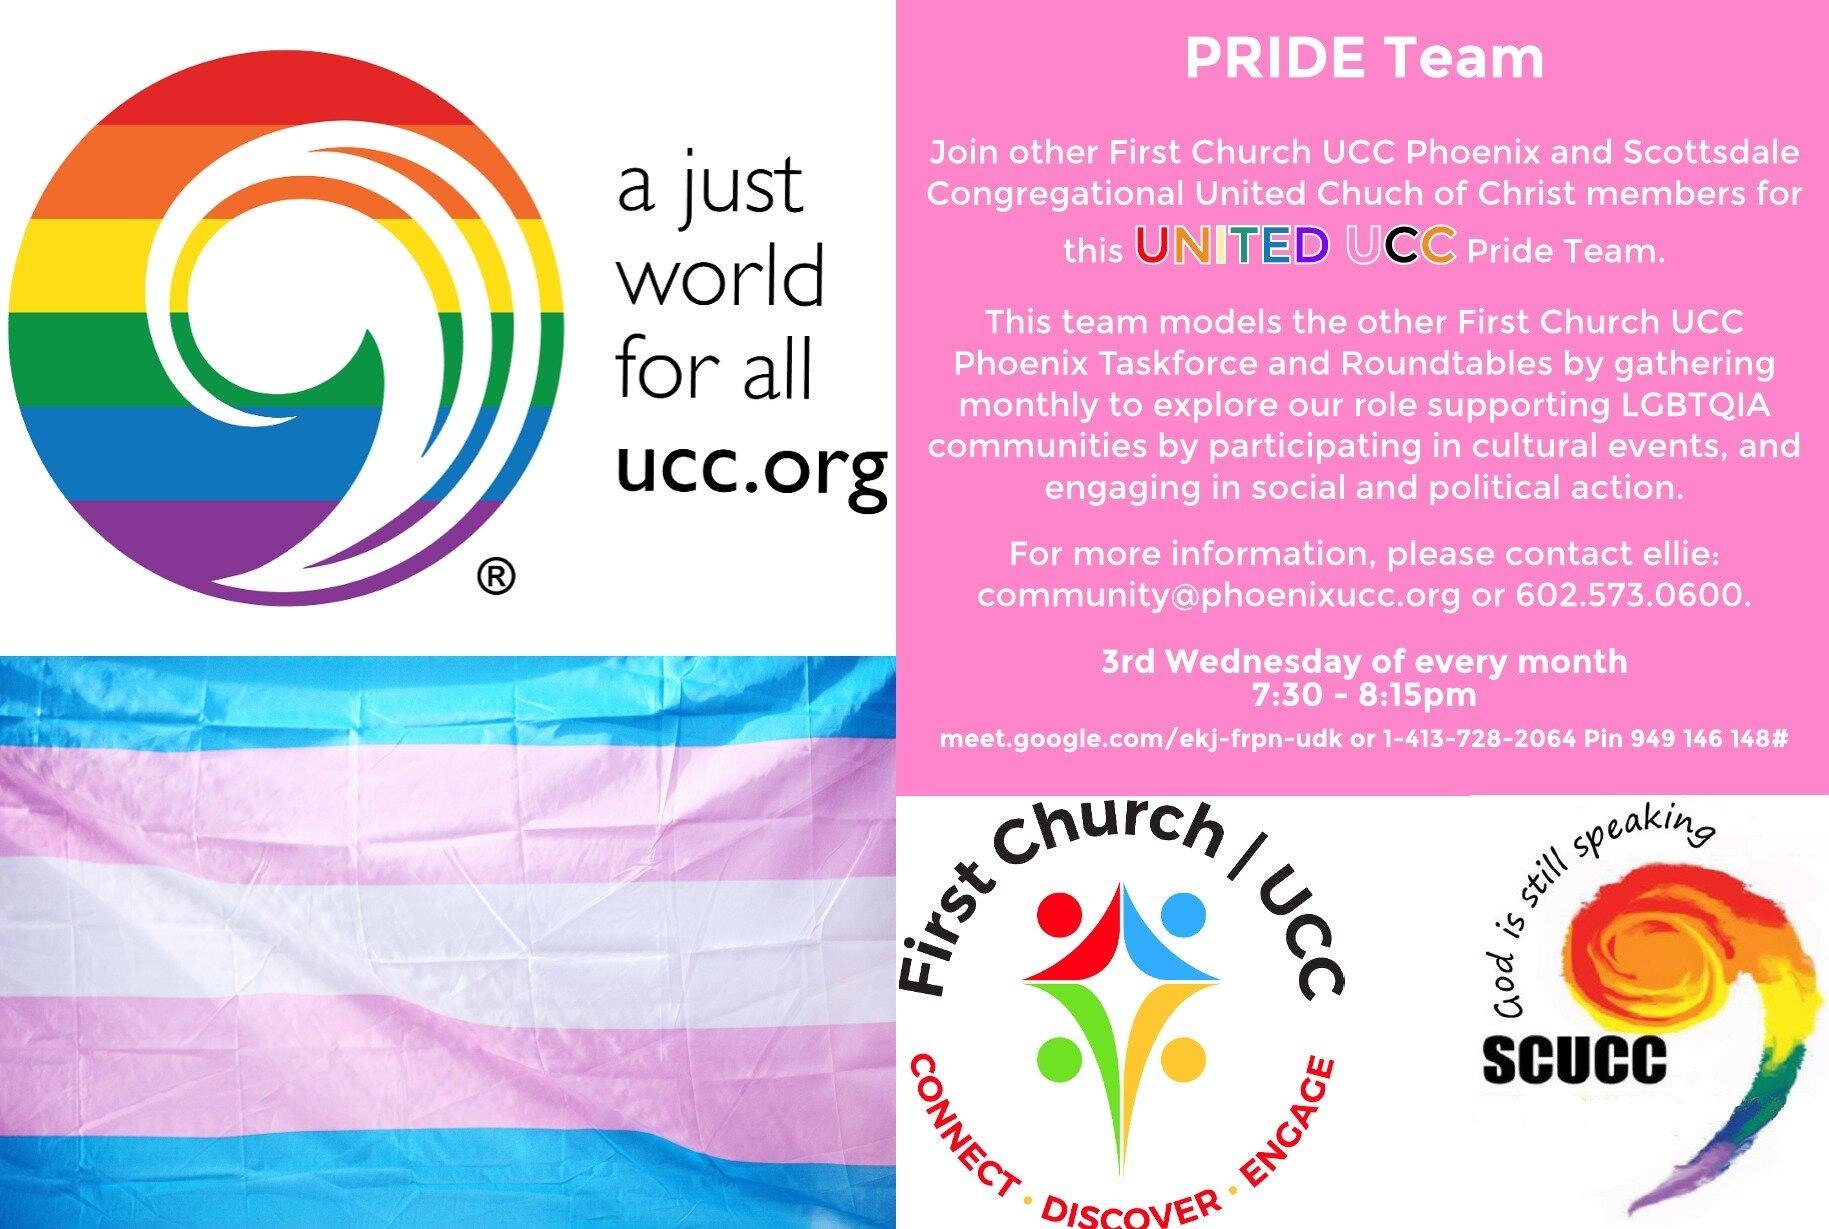 first church pride team marketing 5.jpeg